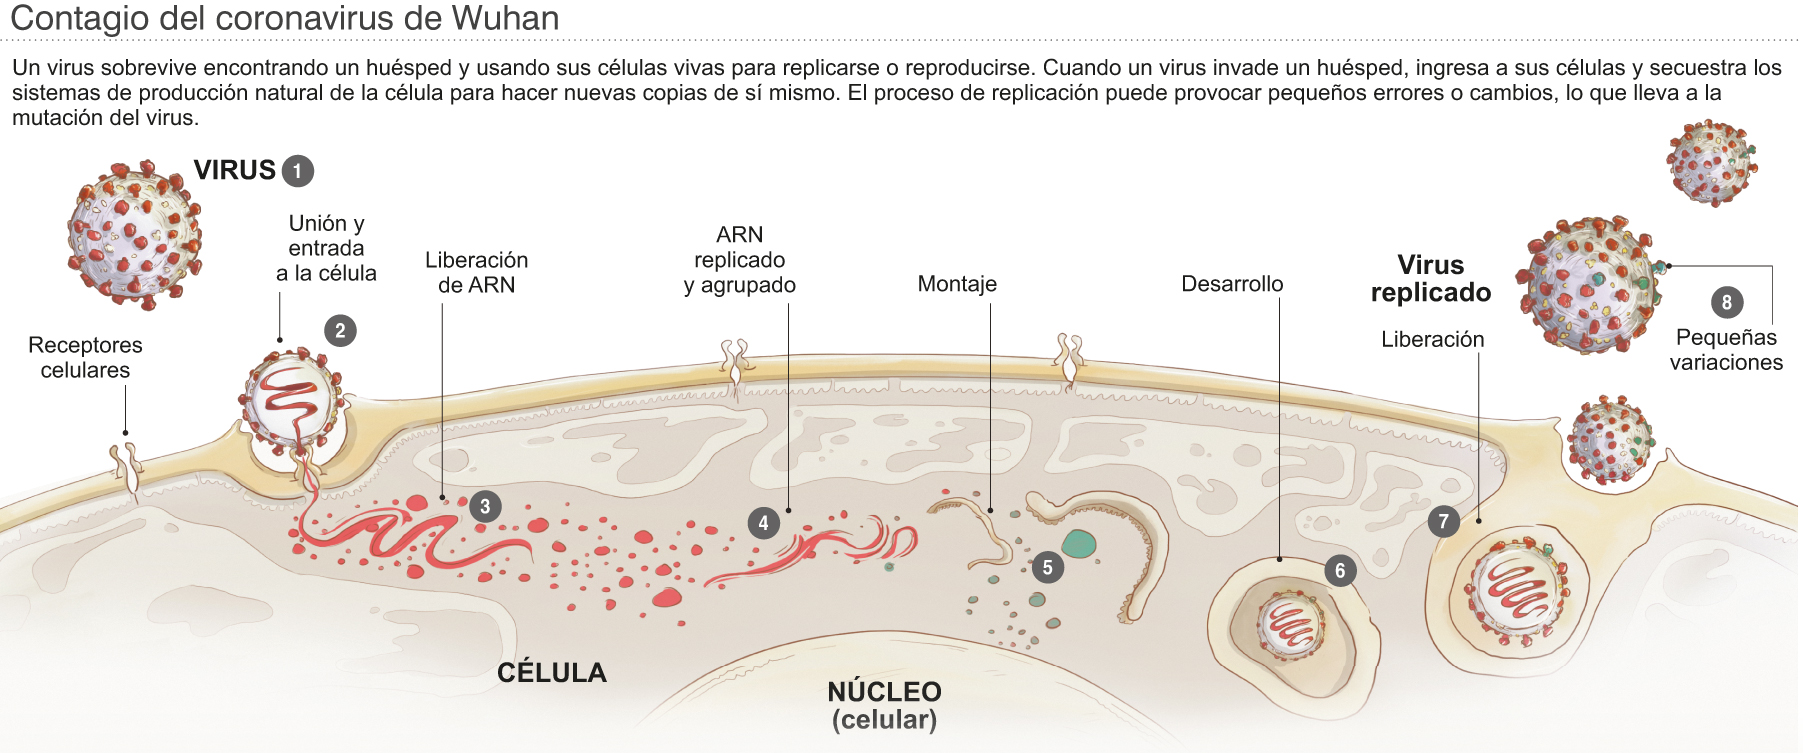 coronavirus contagio propagacion